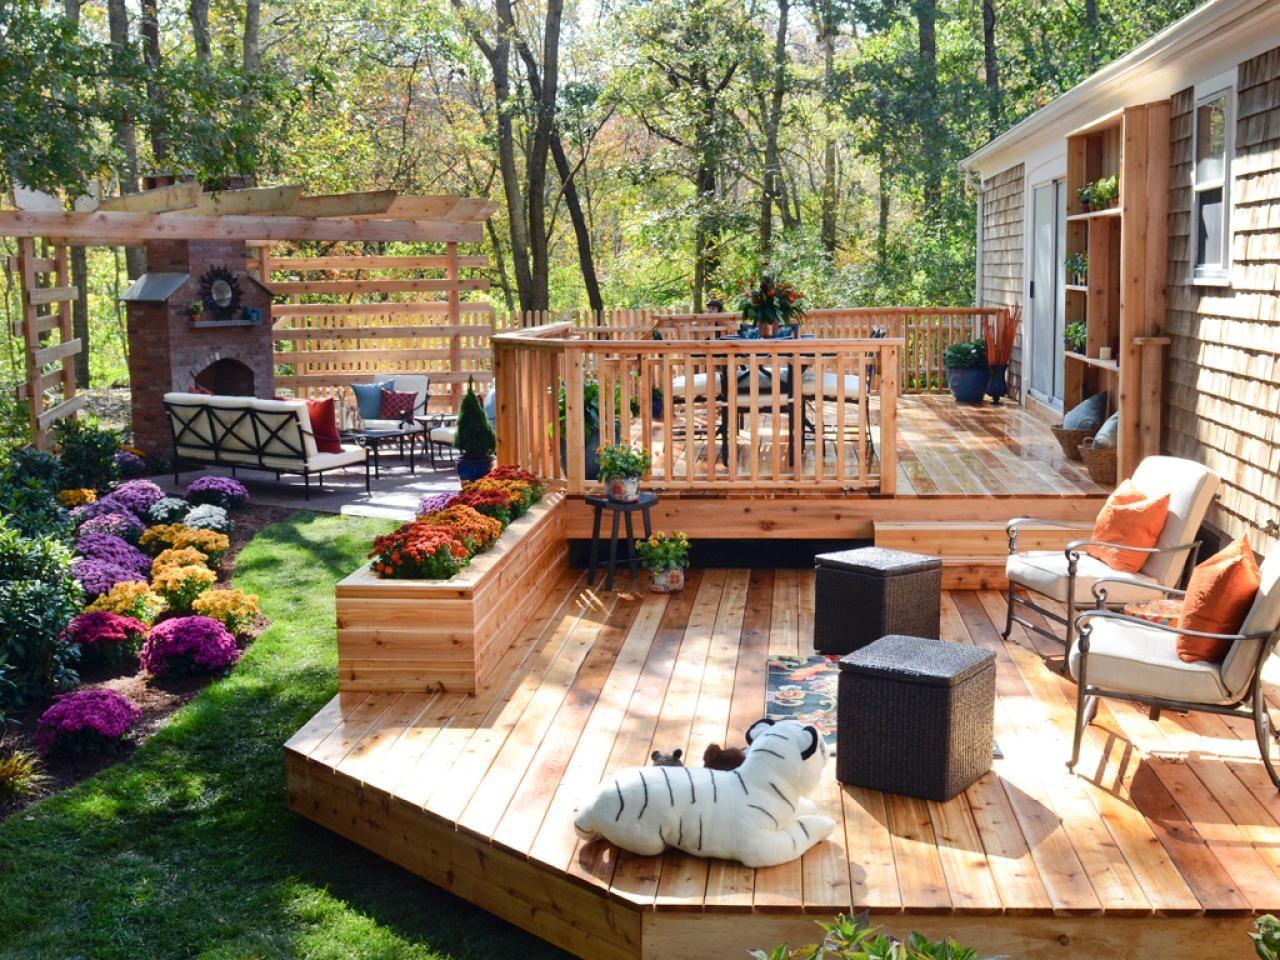 Backyard Transformations From Landscape Designer Chris Lambton